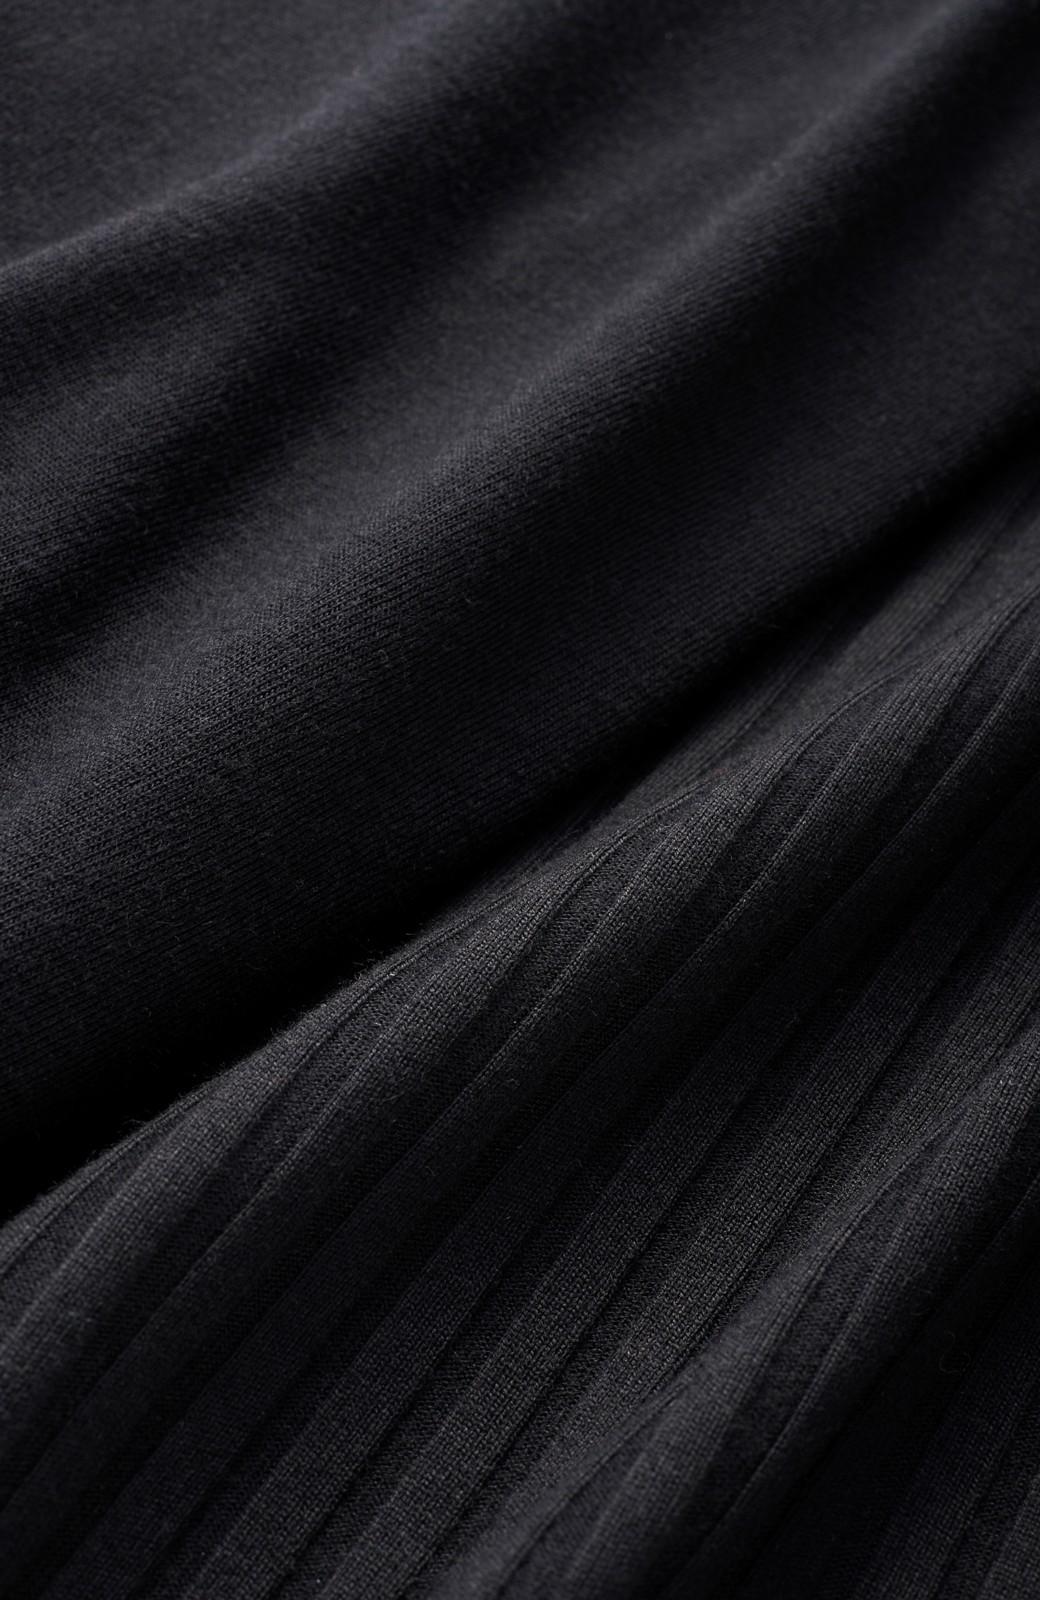 haco! 旅の救世主!3泊4日のテレコオールインワン&大人っぽTシャツセット <ブラック>の商品写真2